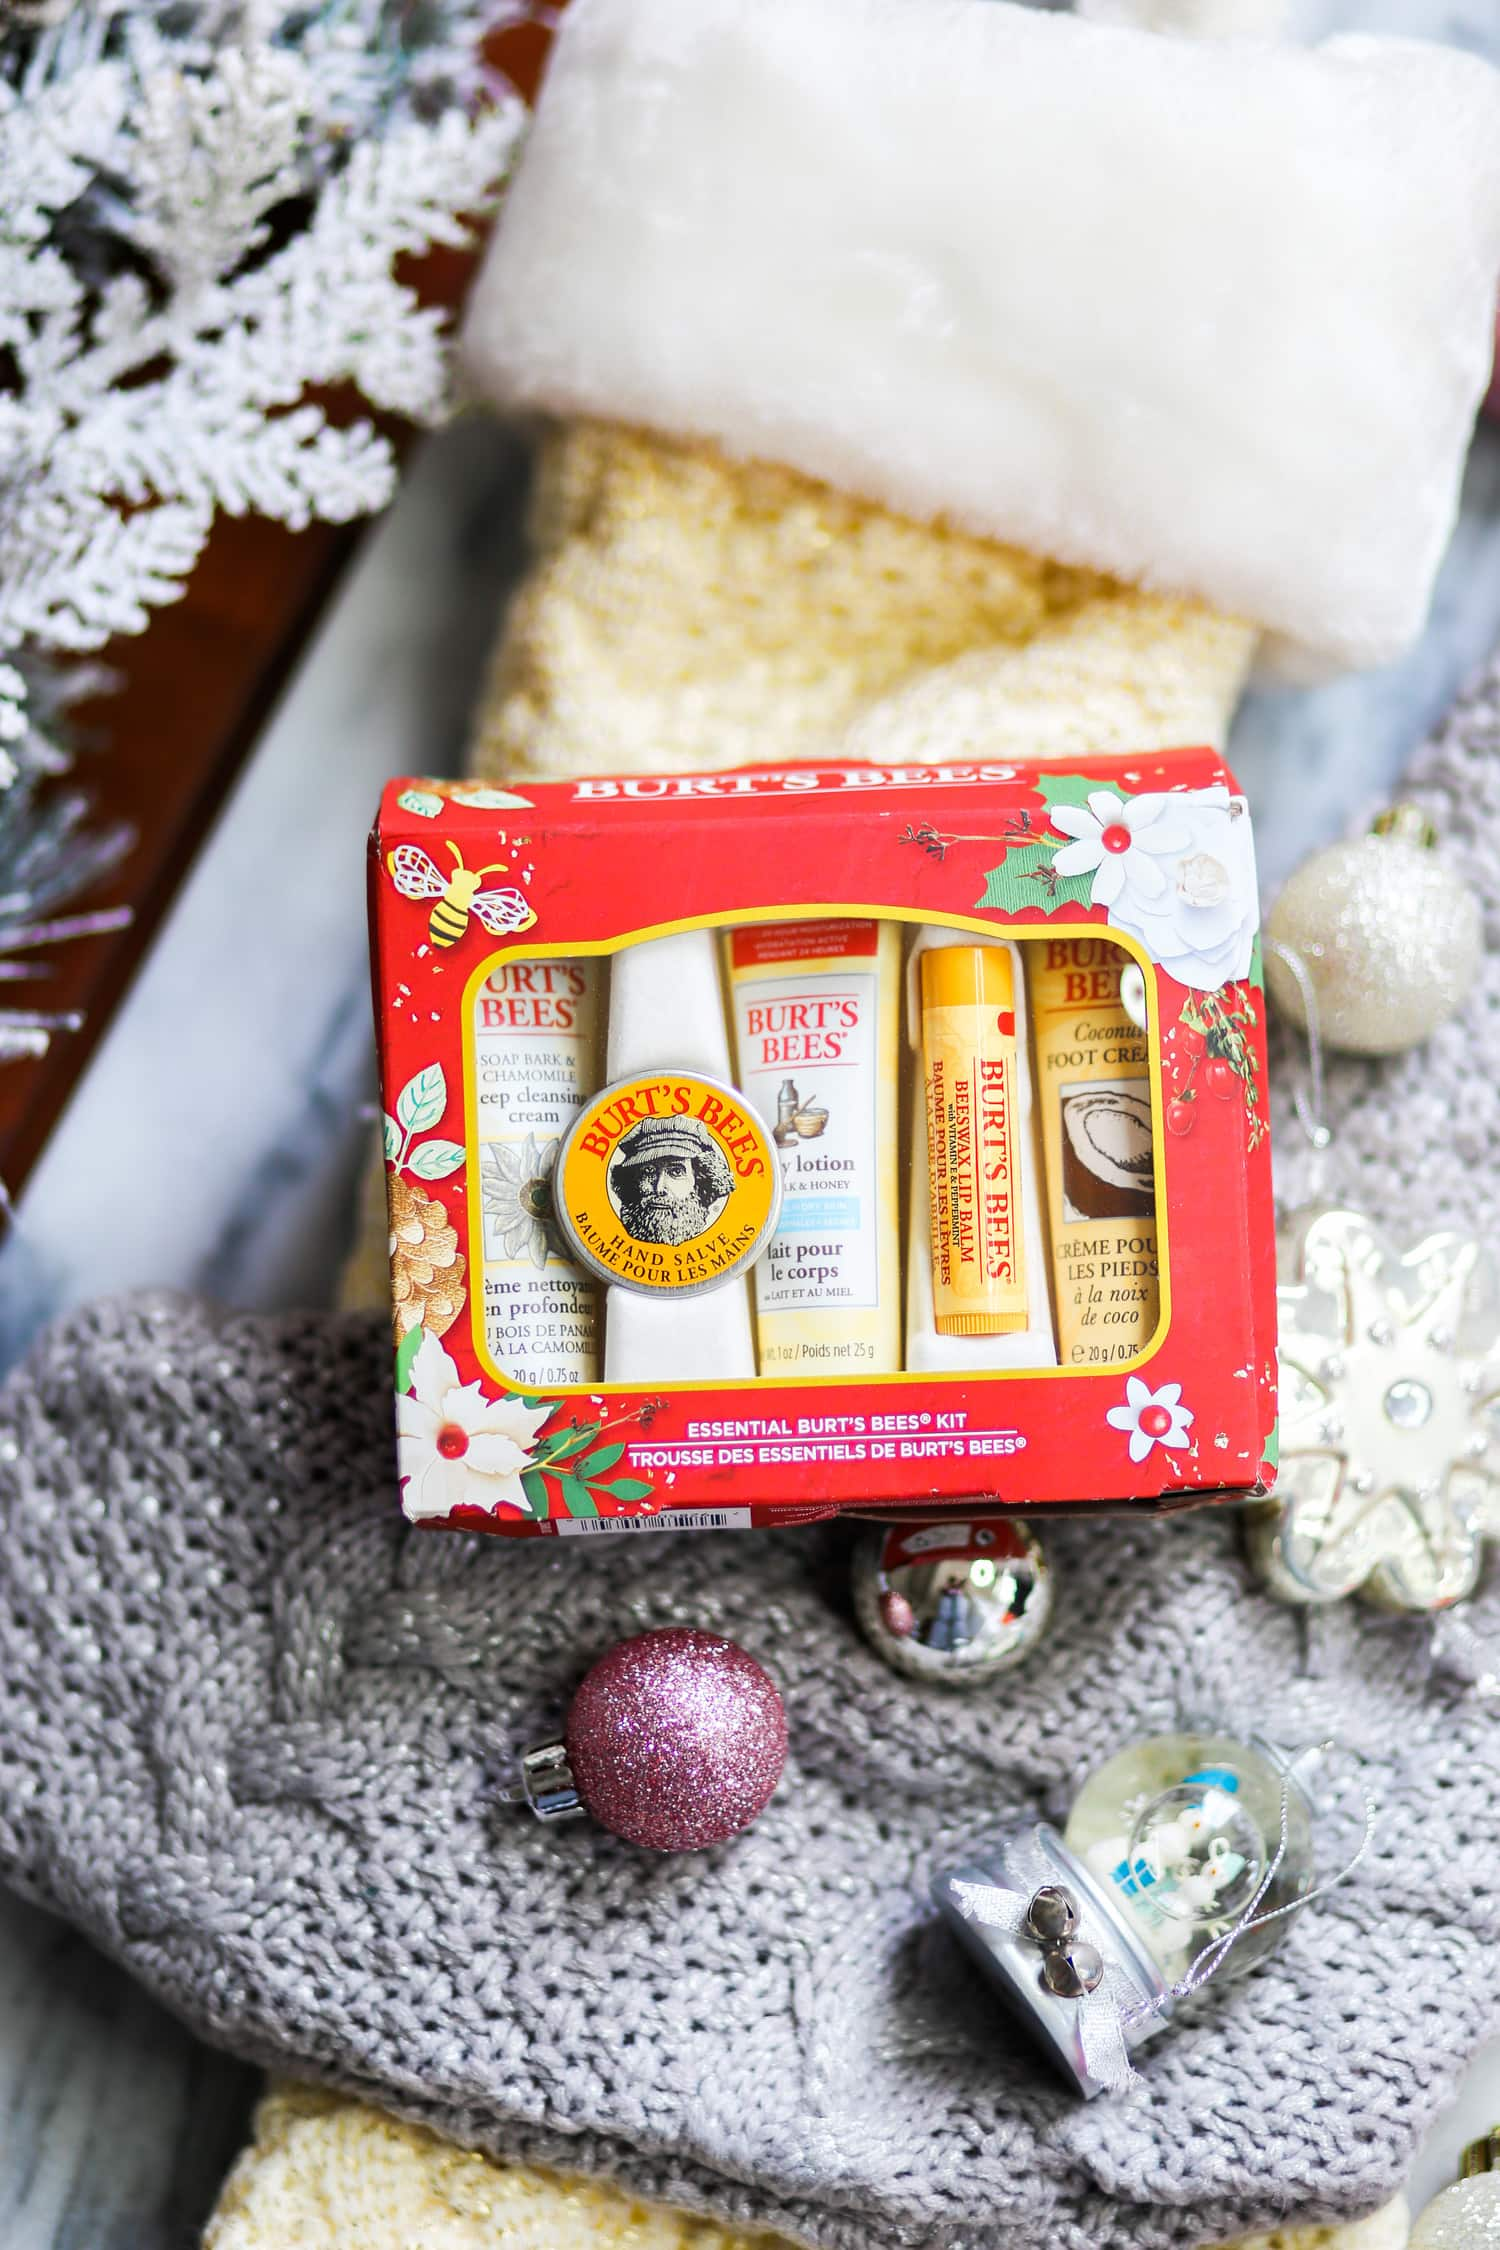 Burt's Bees Christmas gift ideas Christmas tree ornaments Ashley Brooke Nicholas blogger